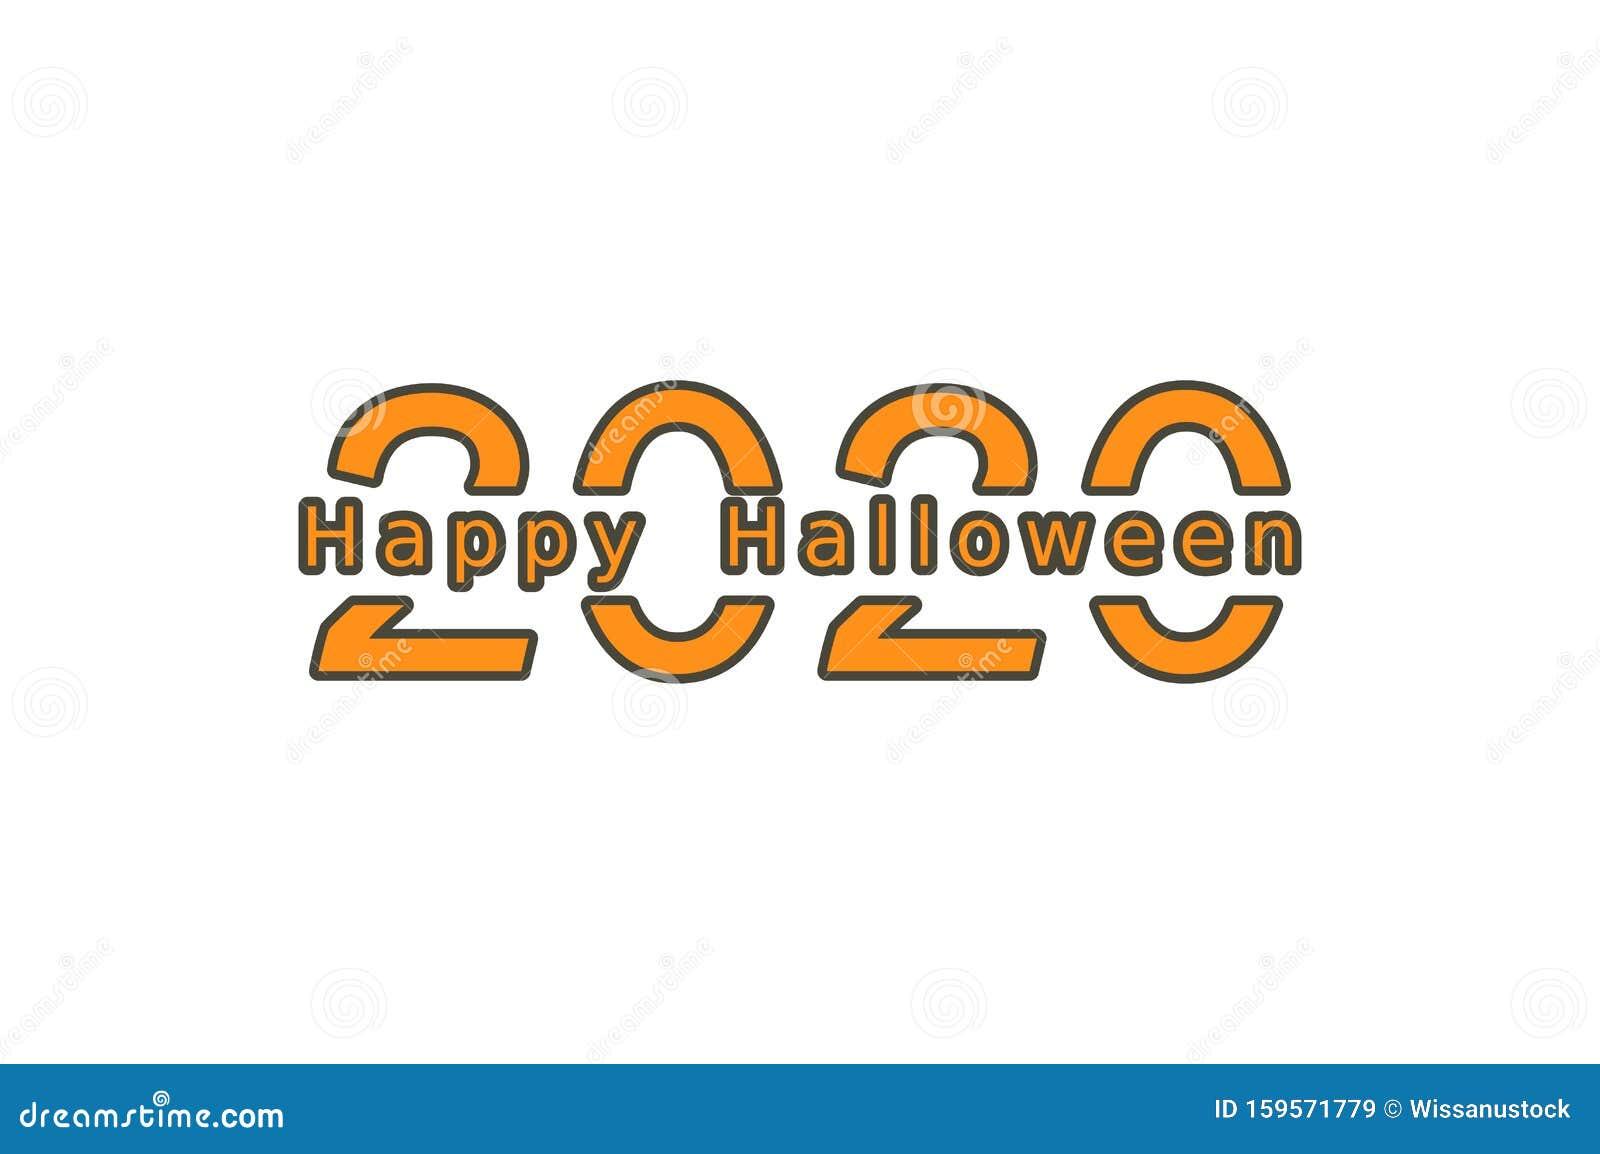 Cute Happy Halloween 2020 2020 Number With Happy Halloween Word Stock Vector   Illustration